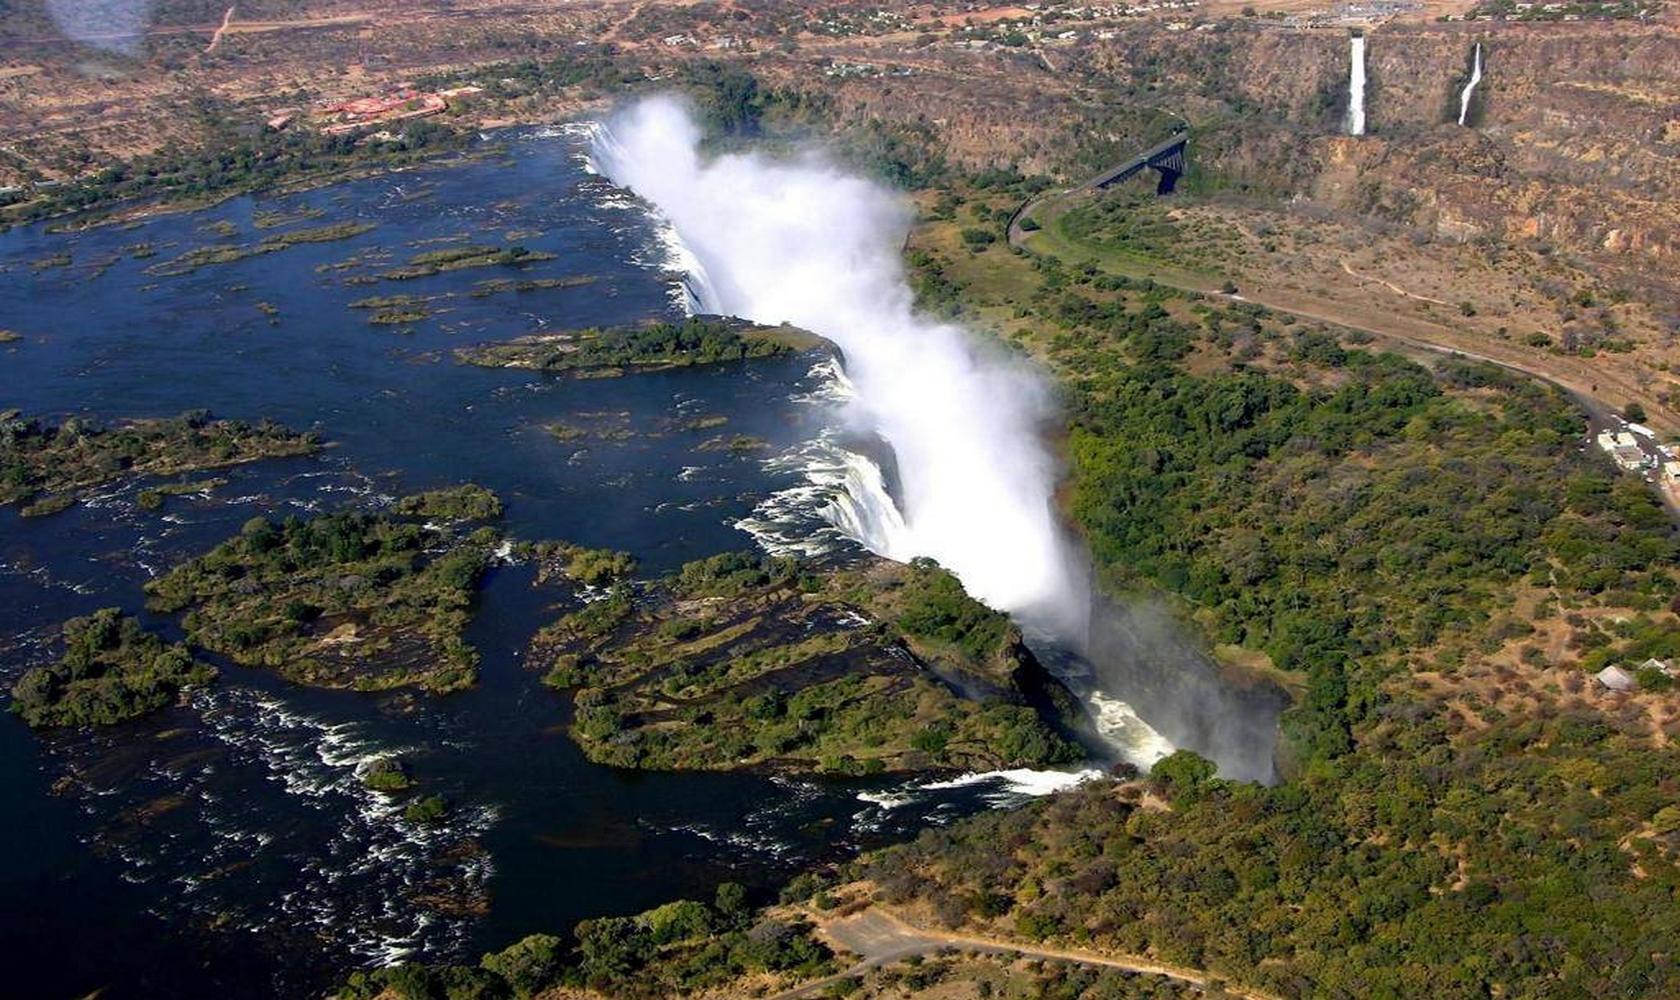 Africa_Chutes_Victoria_002-1680-1000.jpg